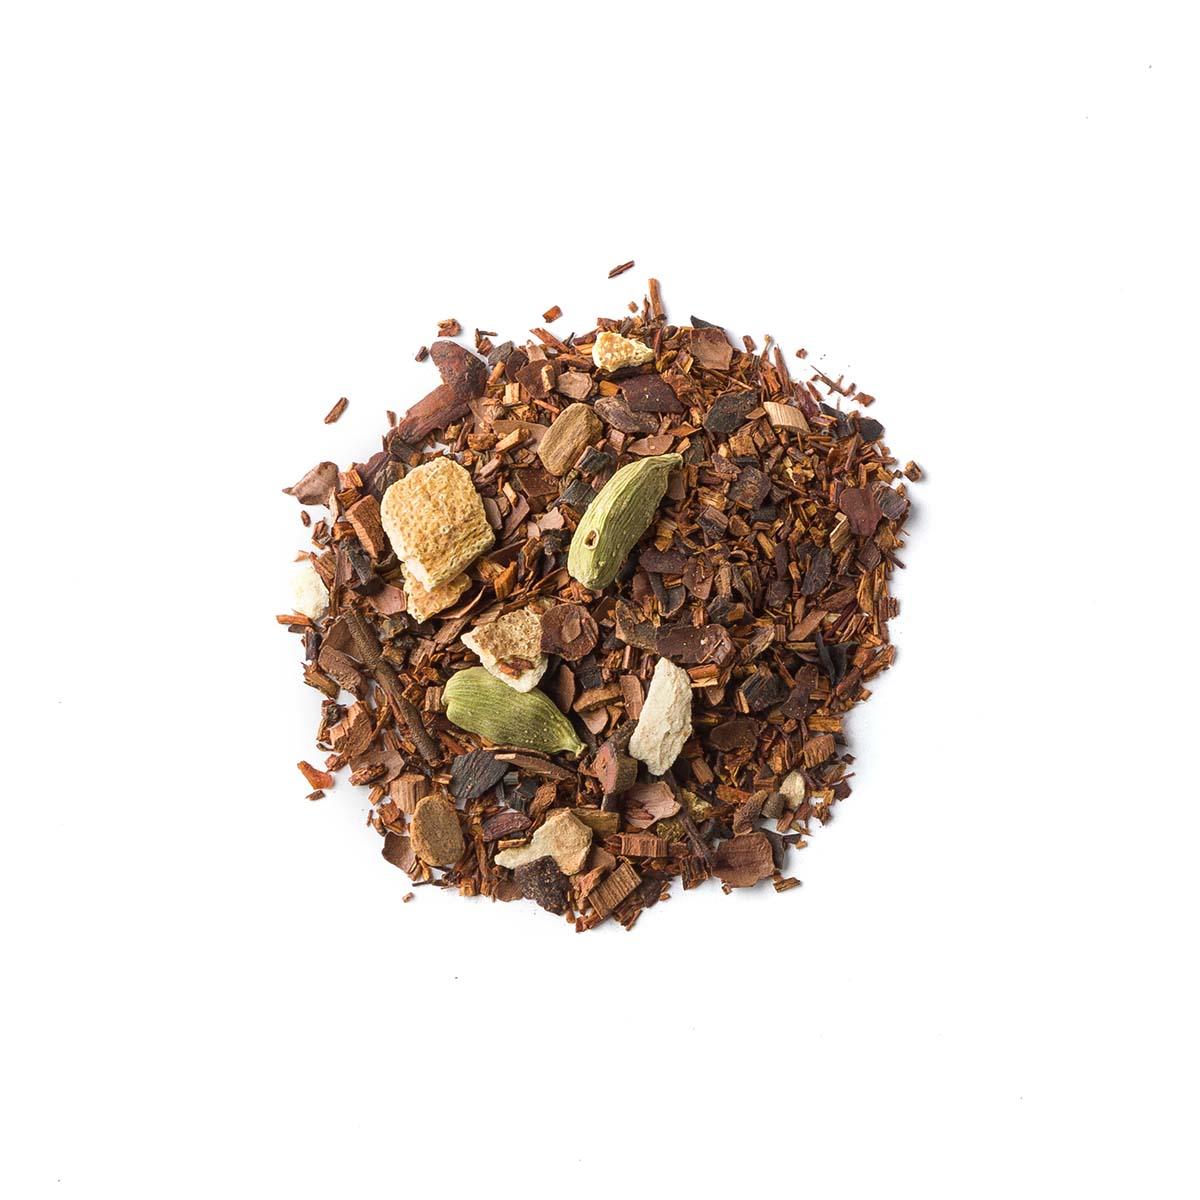 Tilsa. Blend rooibosa z kakaowcem i przyprawami - Brown House & Tea | JestemSlow.pl